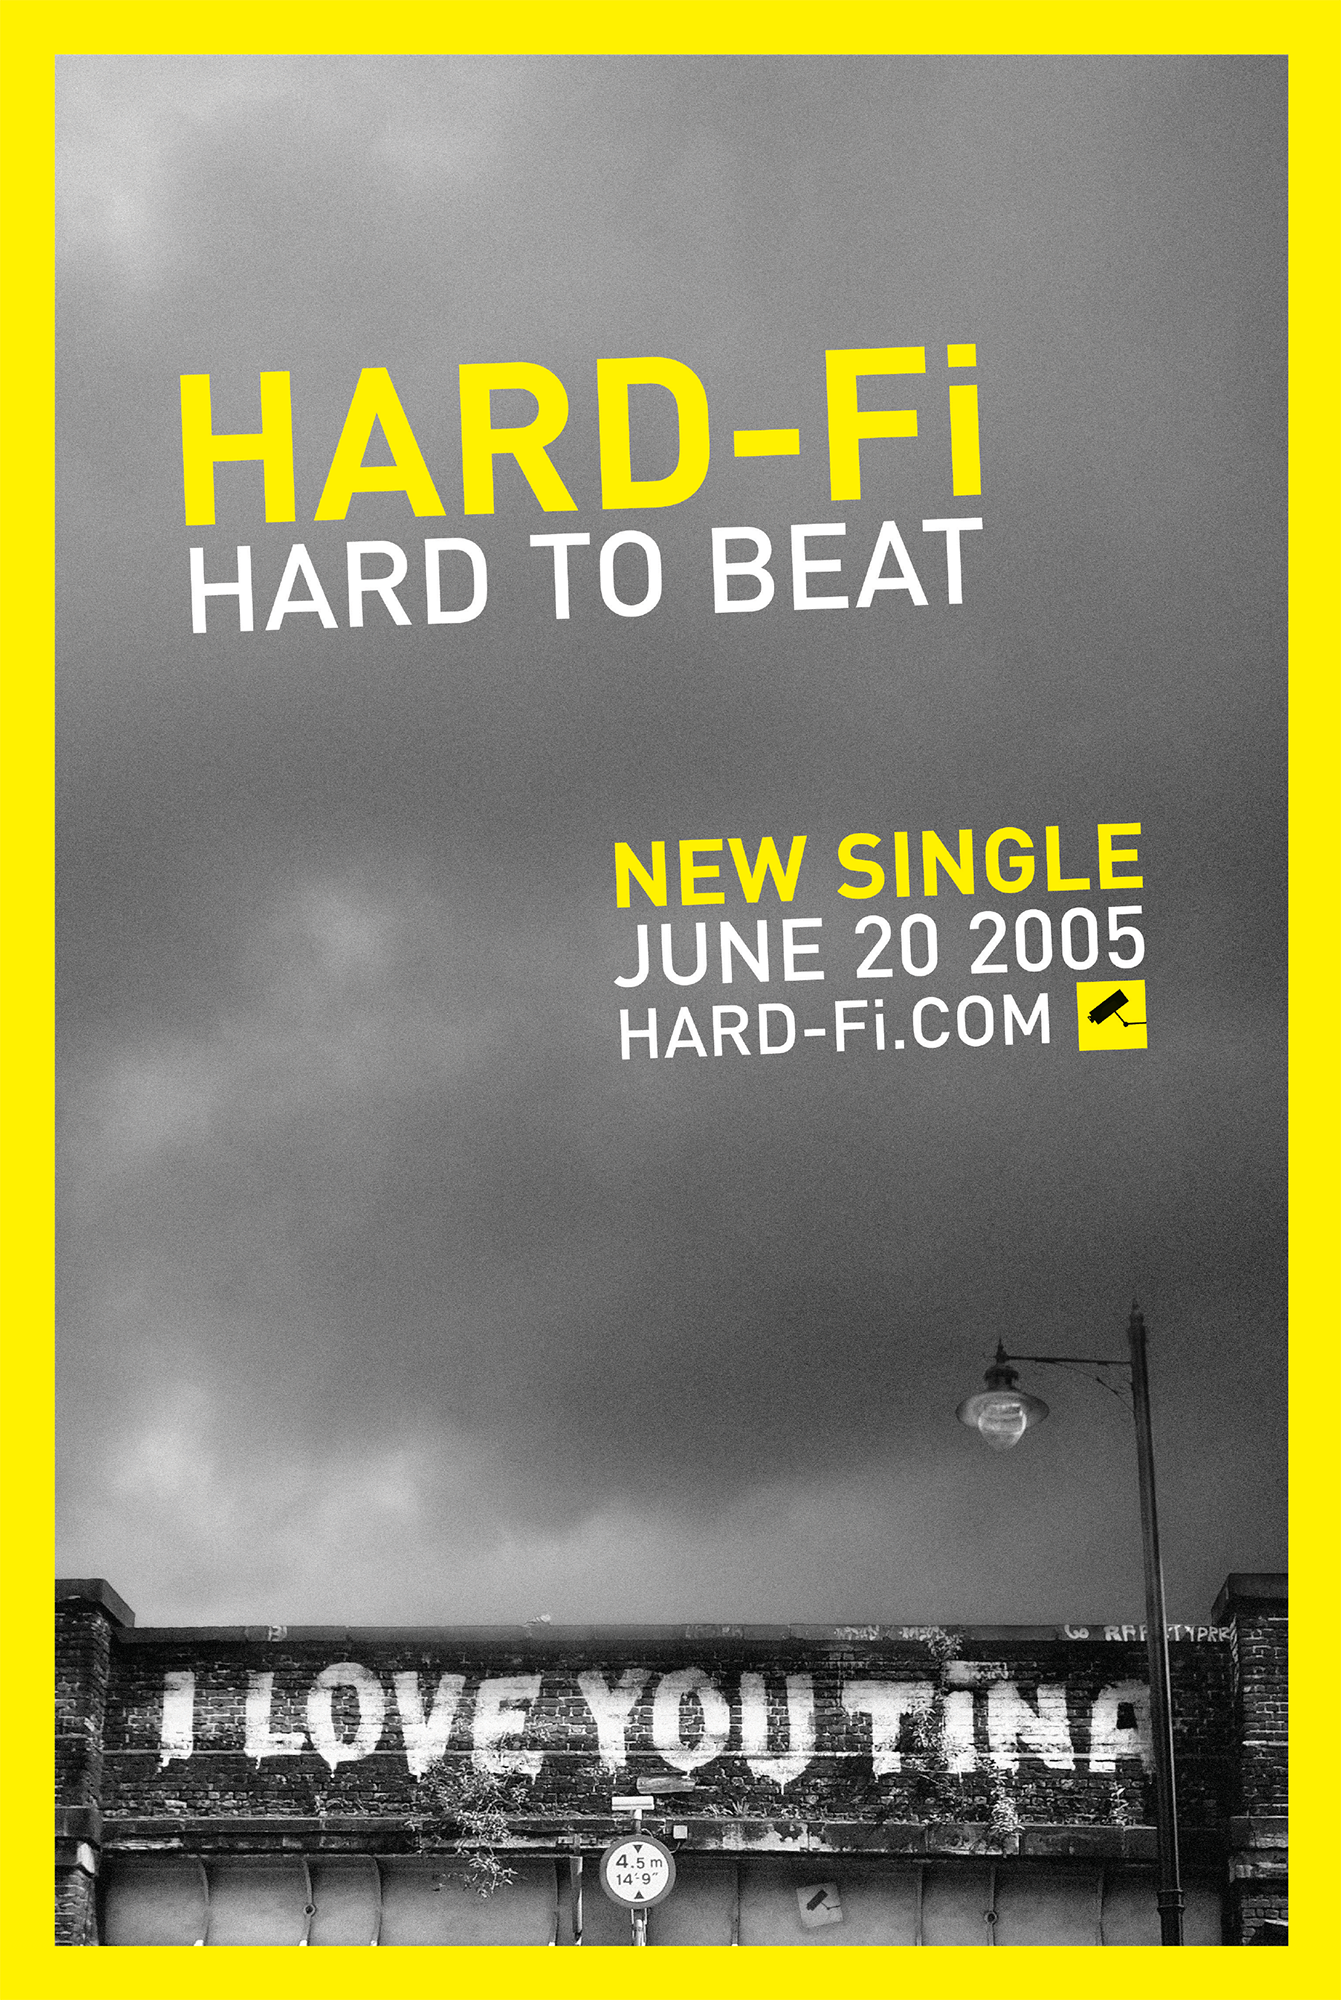 HardFi_work-13.png